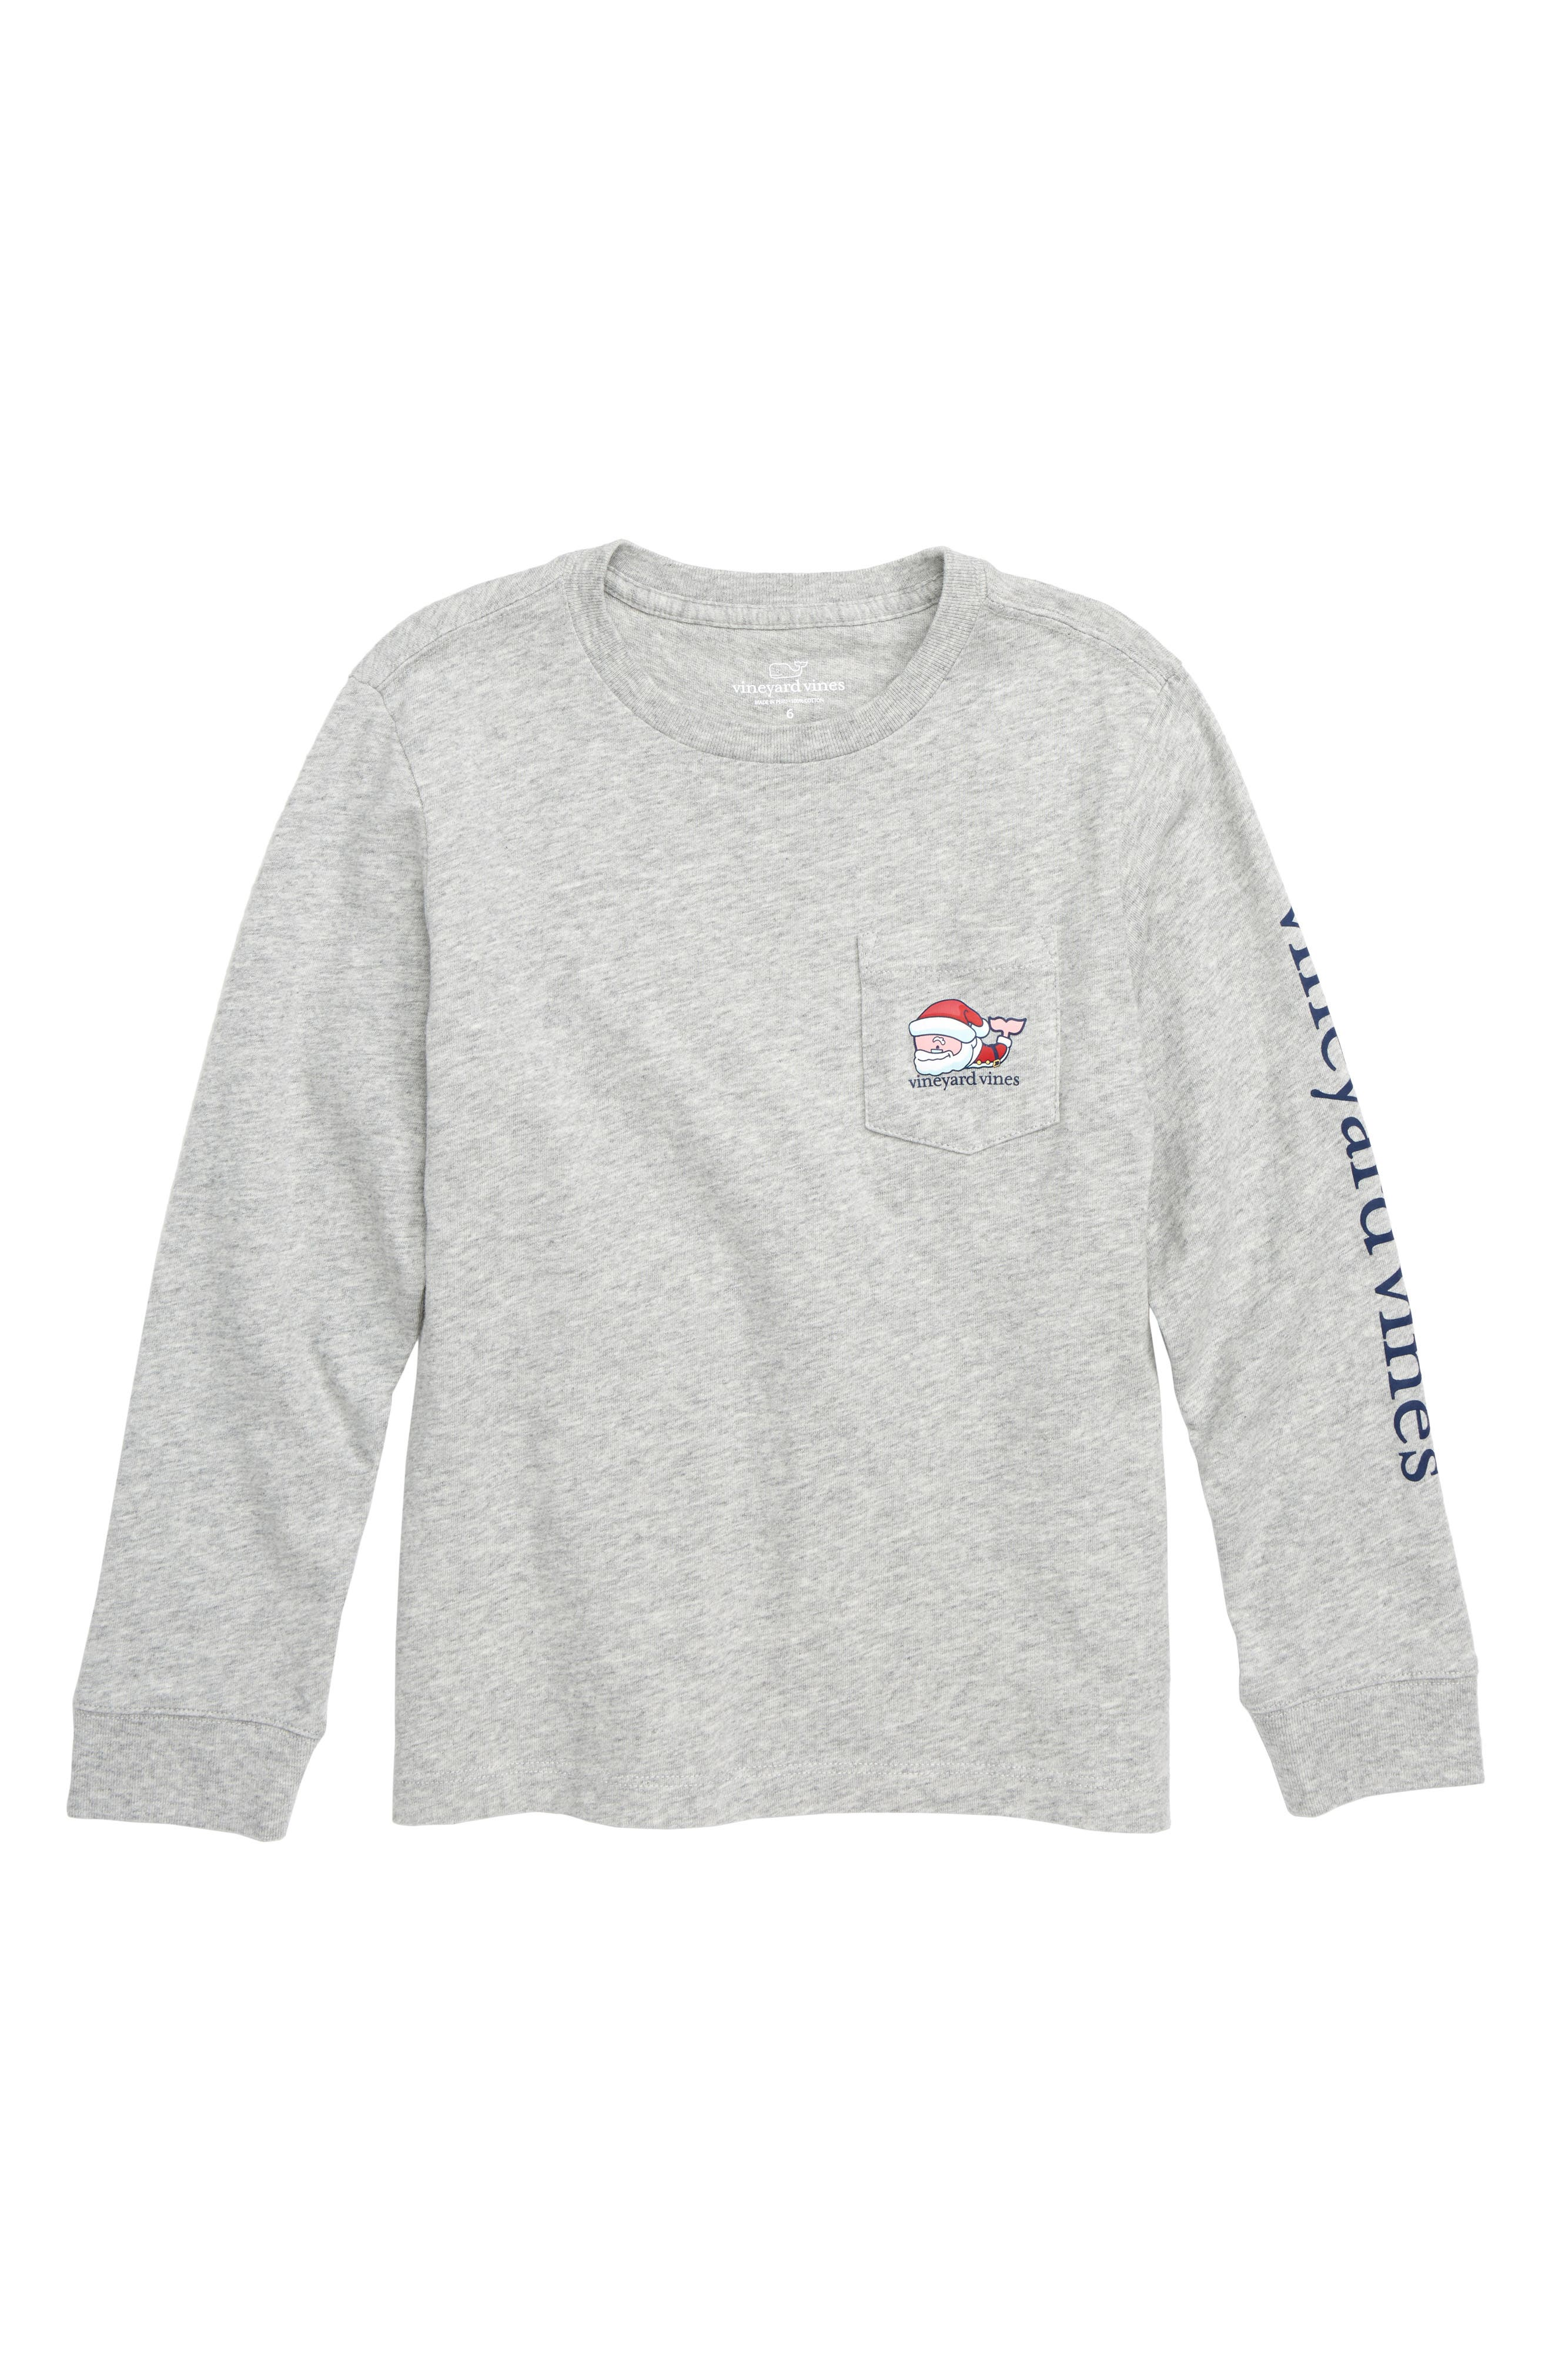 Boys Vineyard Vines Naughty Or Nice Santa Whale Pocket TShirt Size 6  Grey